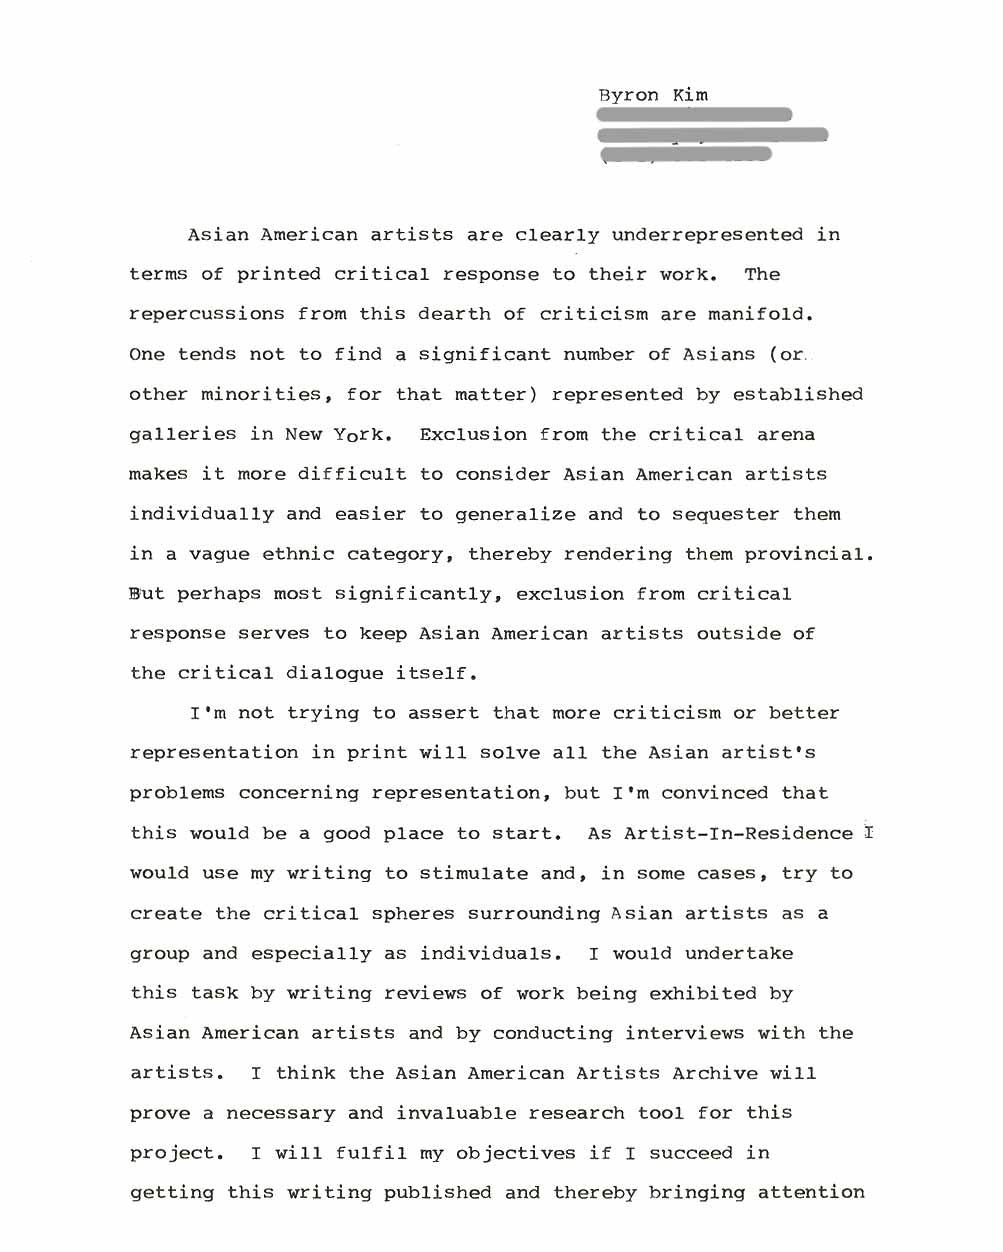 Byron Kim's Artist Statement, pg 1